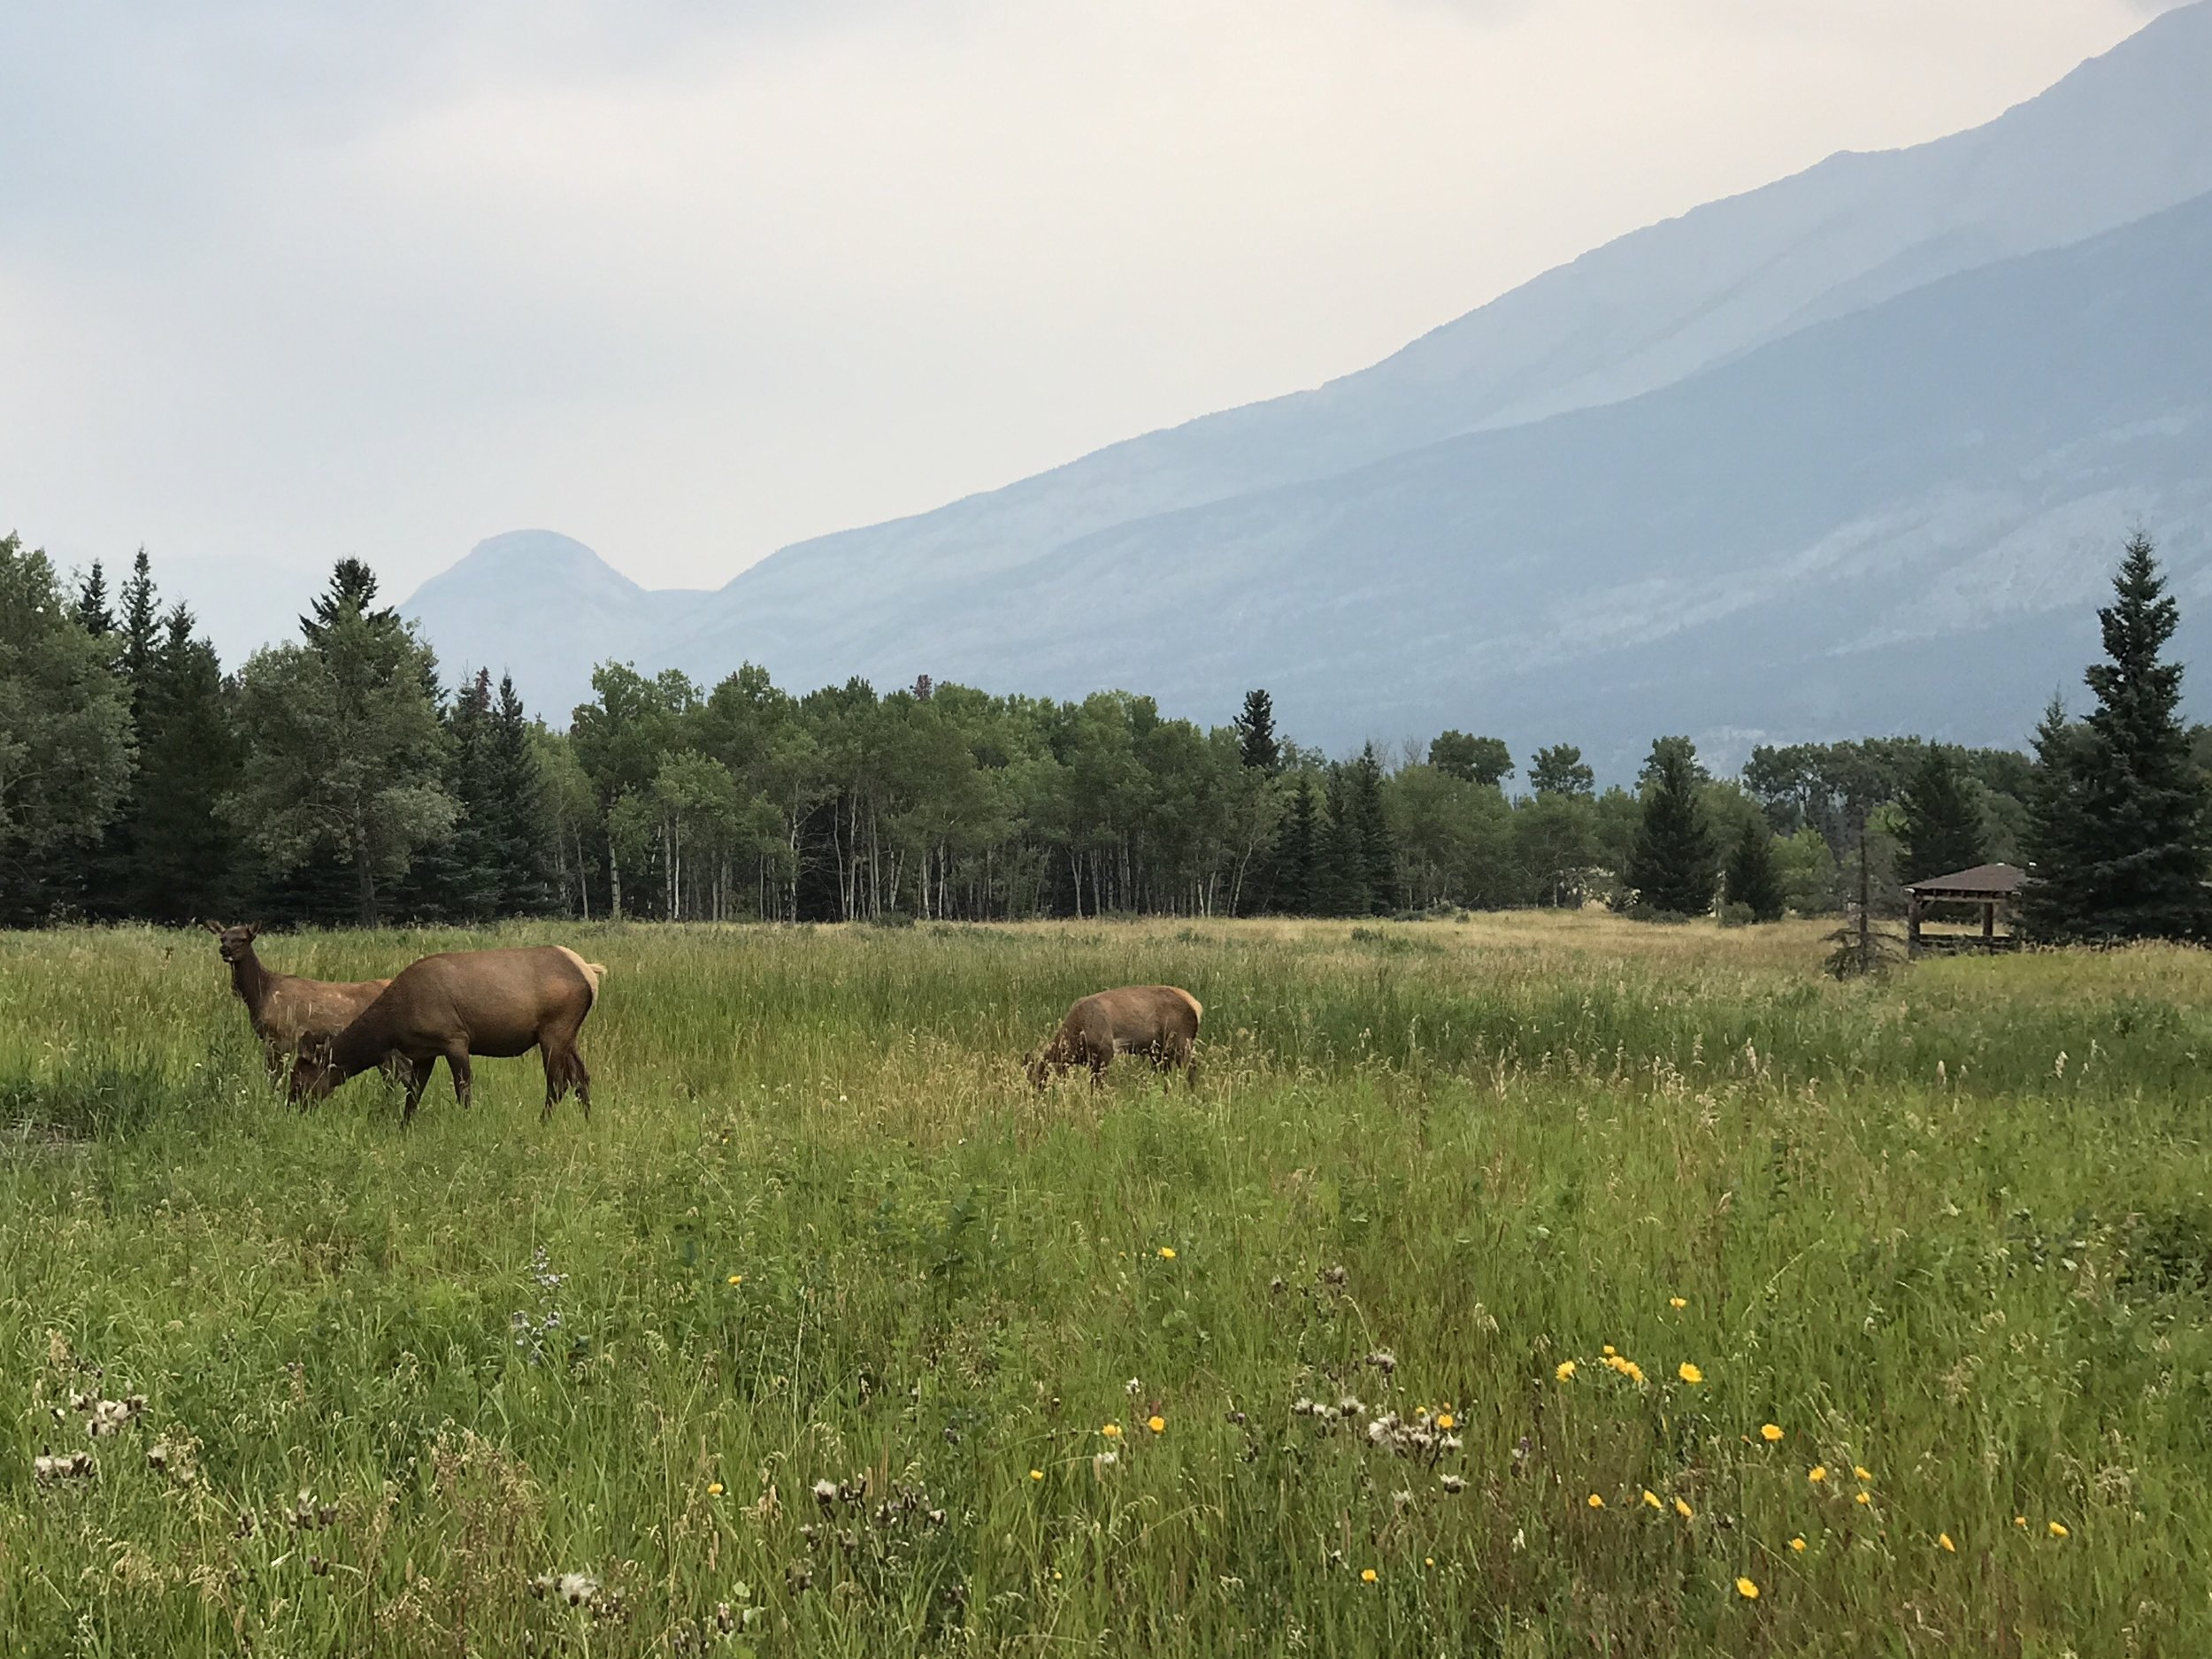 Elk in Field.jpg